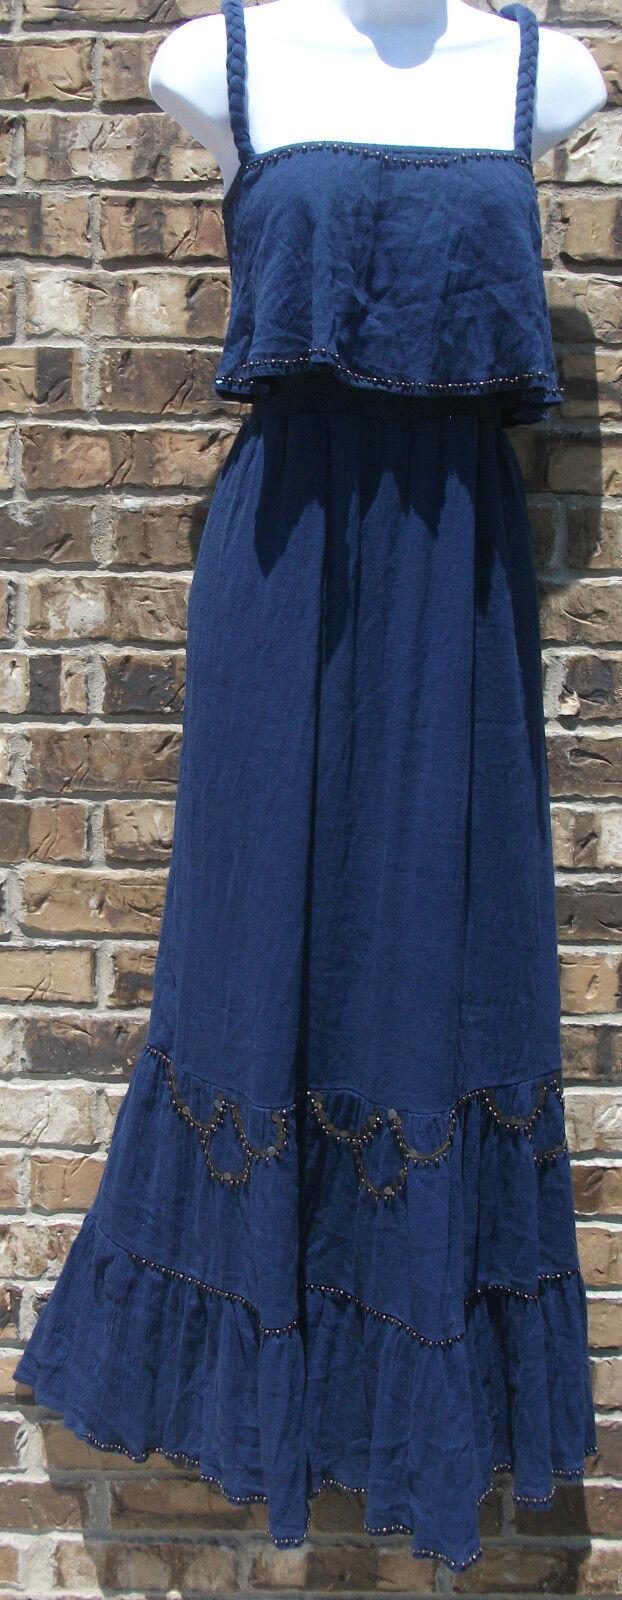 NWT STYLE & CO braided strap cabana embellished beaded bluee sun dress, size PM,L